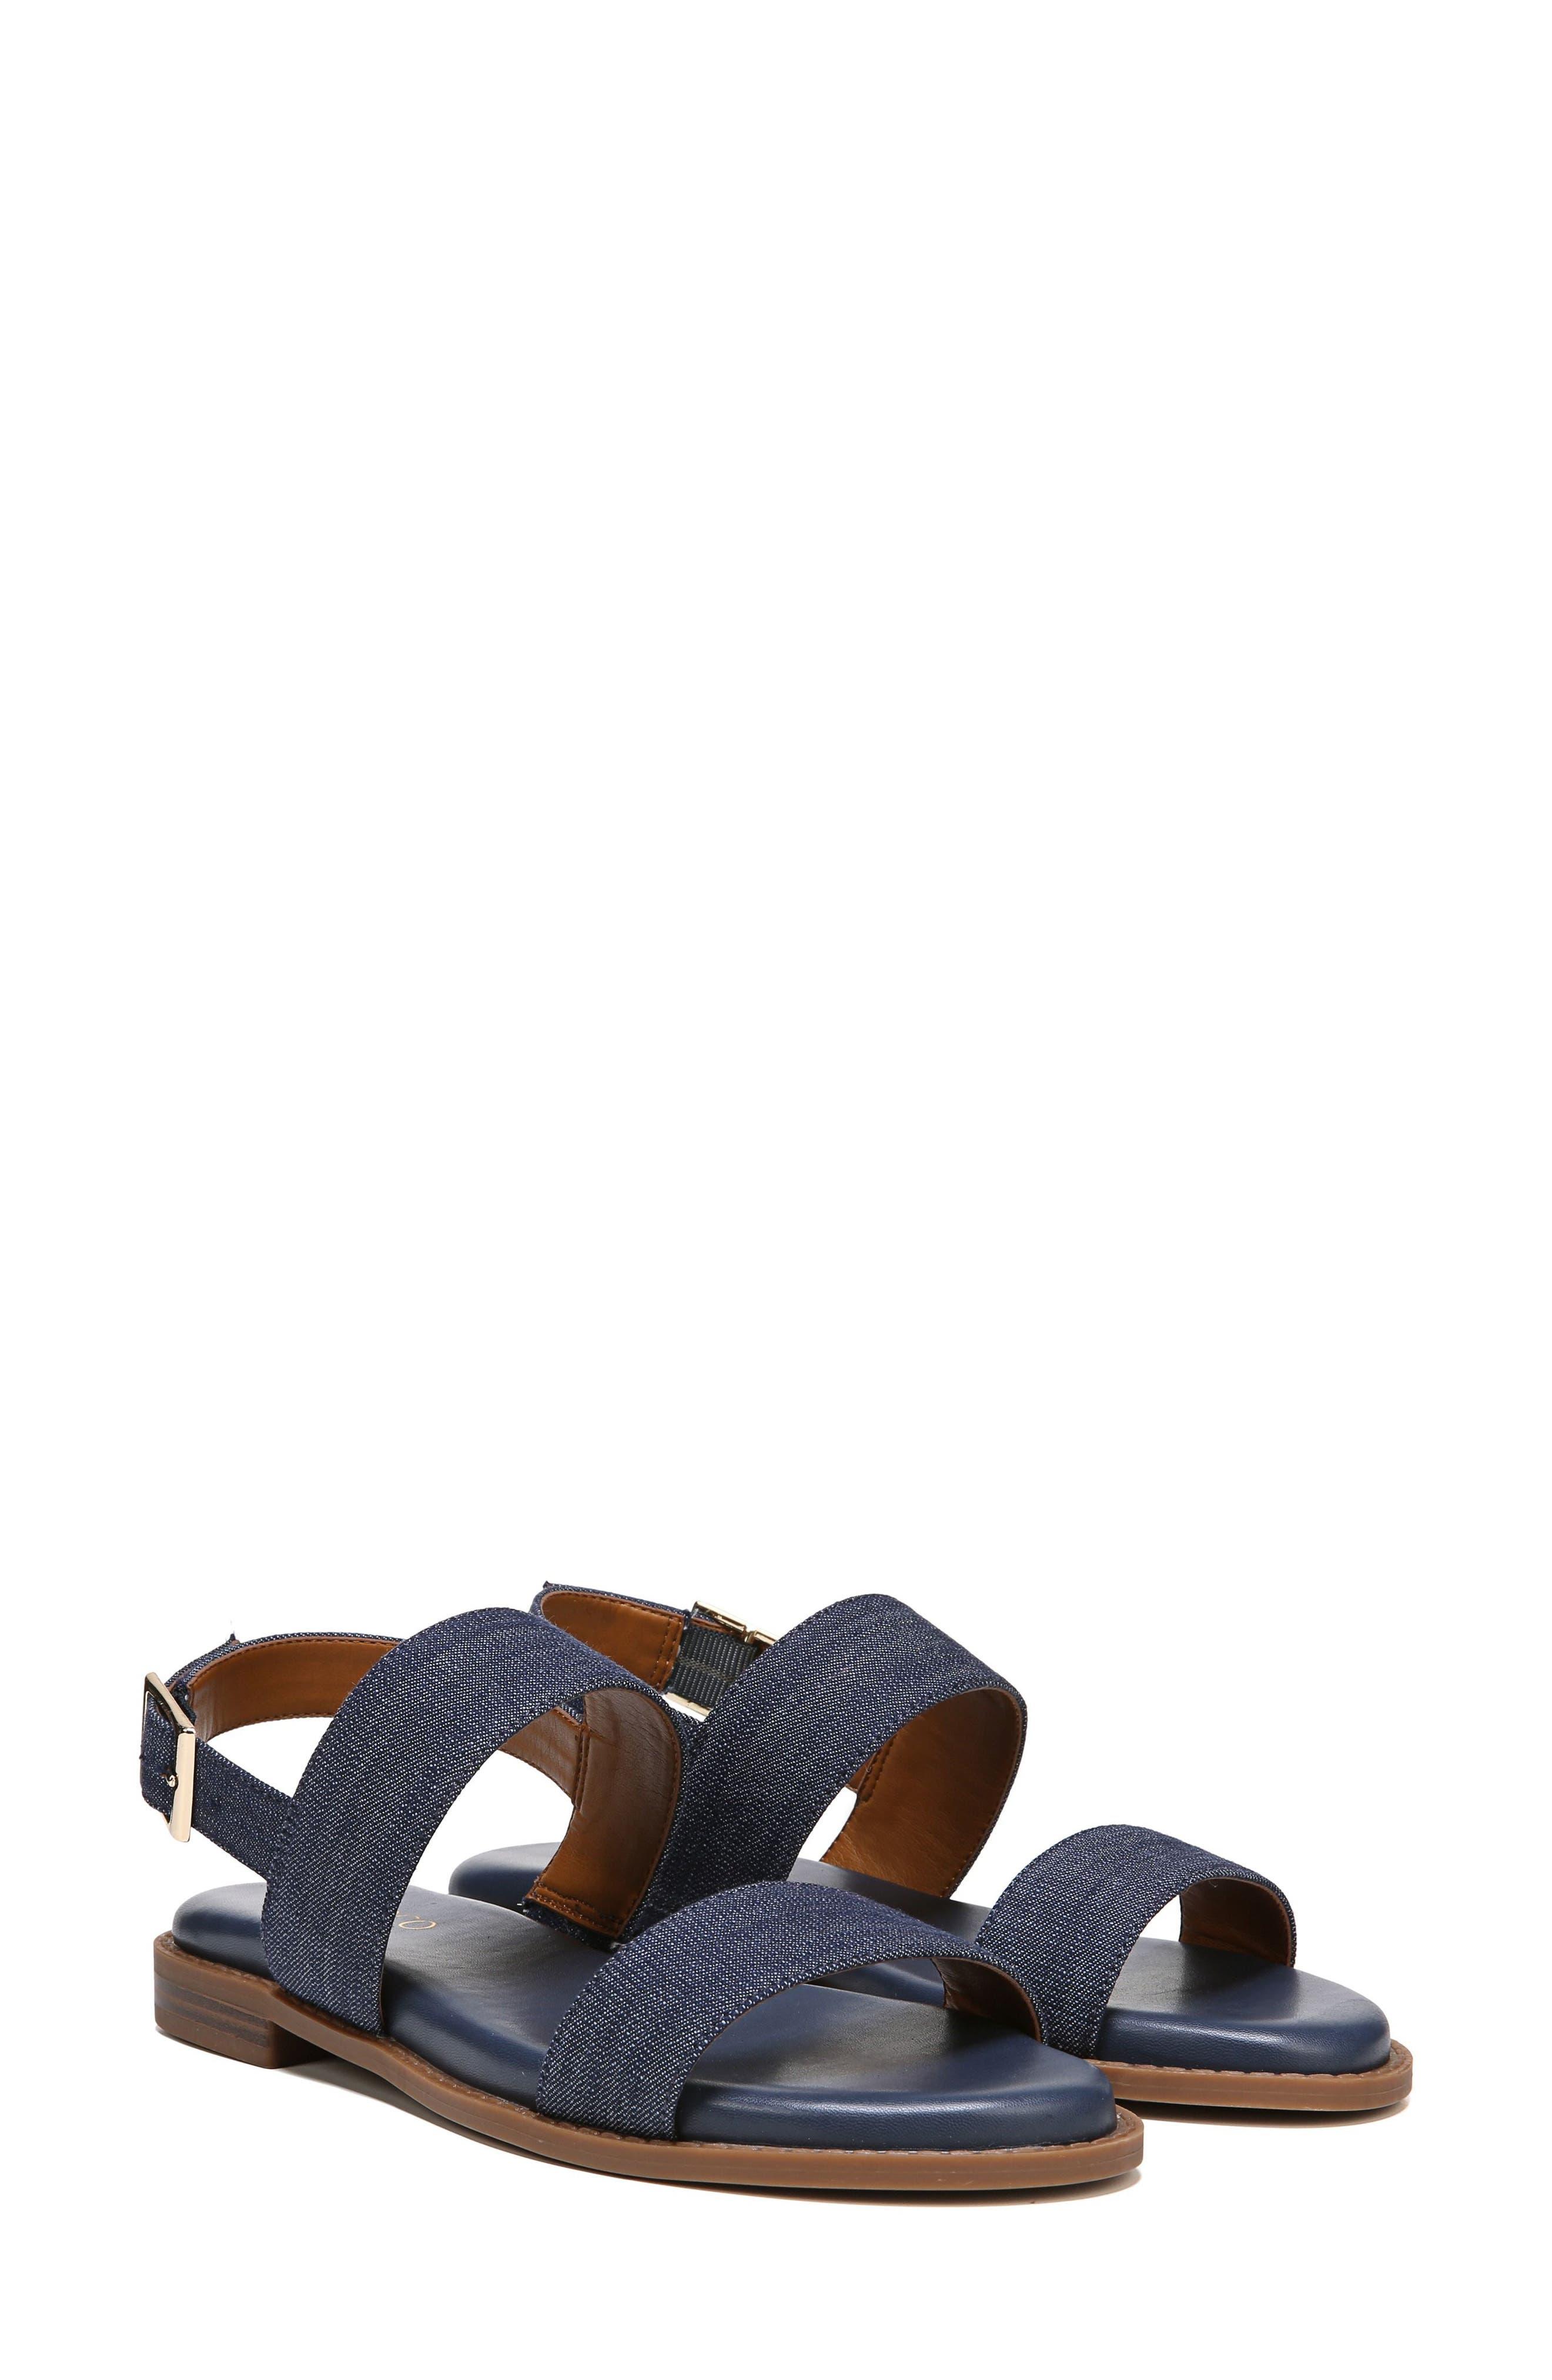 Velocity Sandal,                         Main,                         color, DENIM